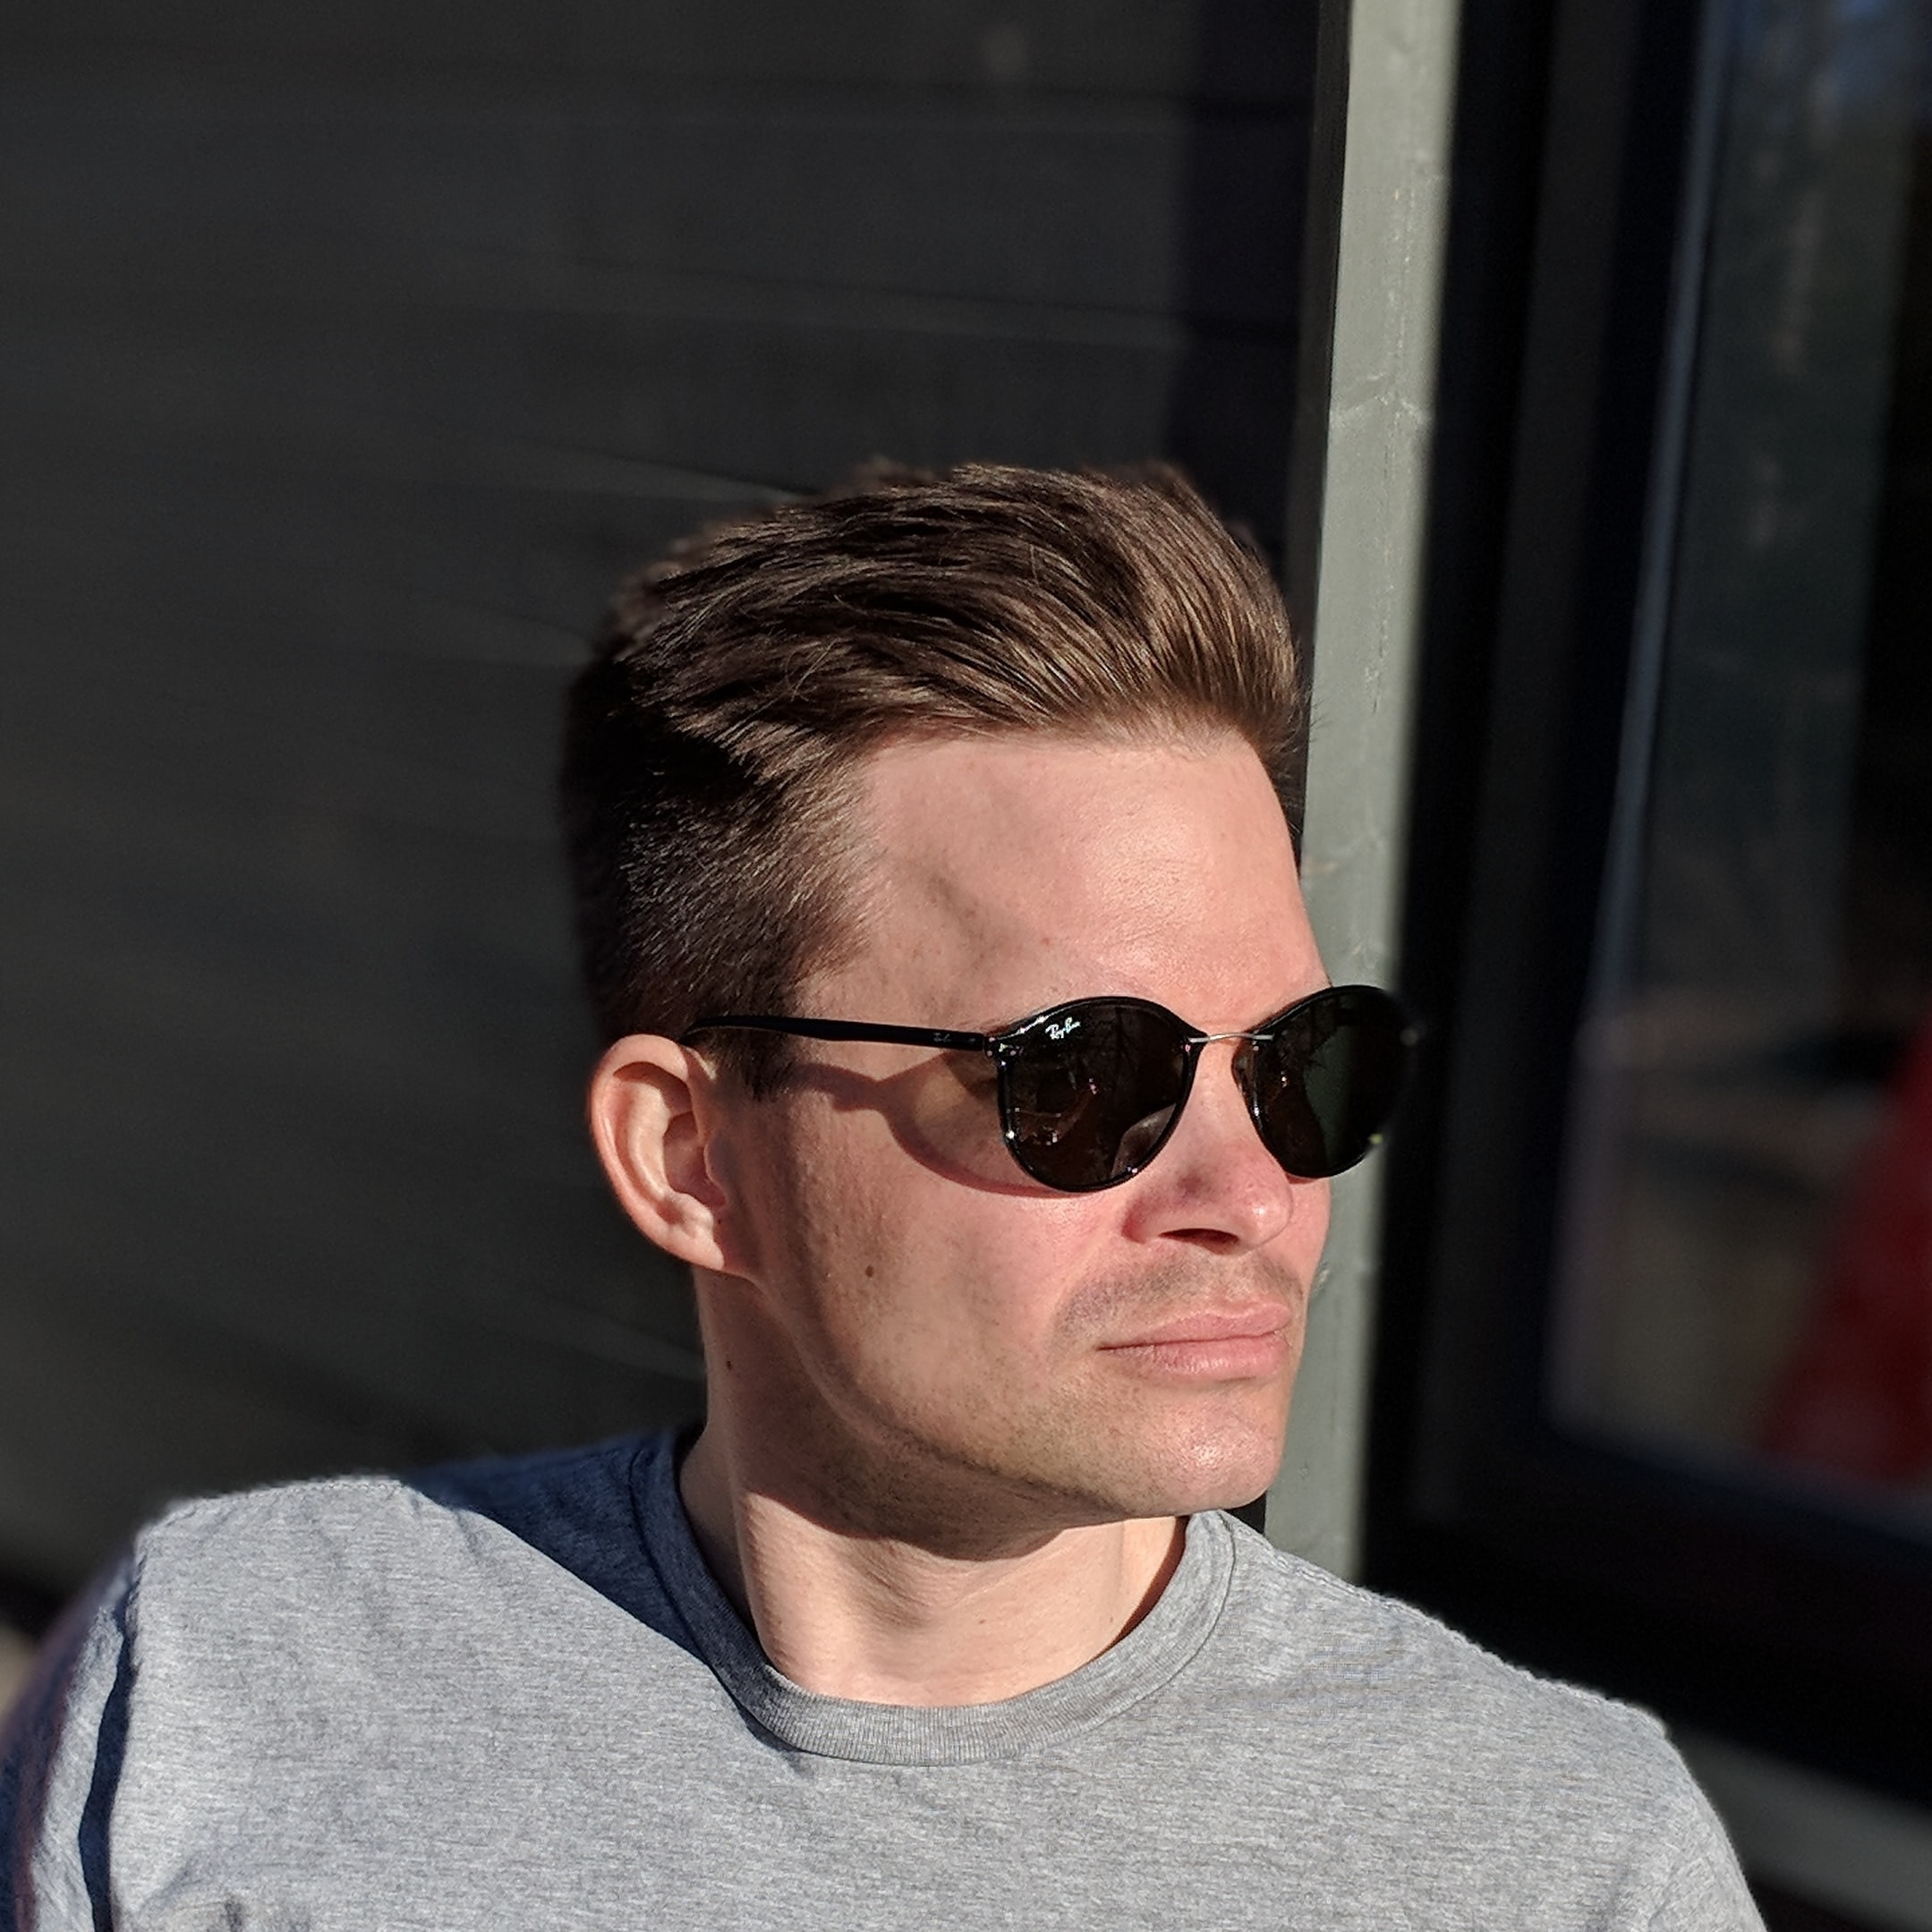 Go to Marcus Tollefsen's profile